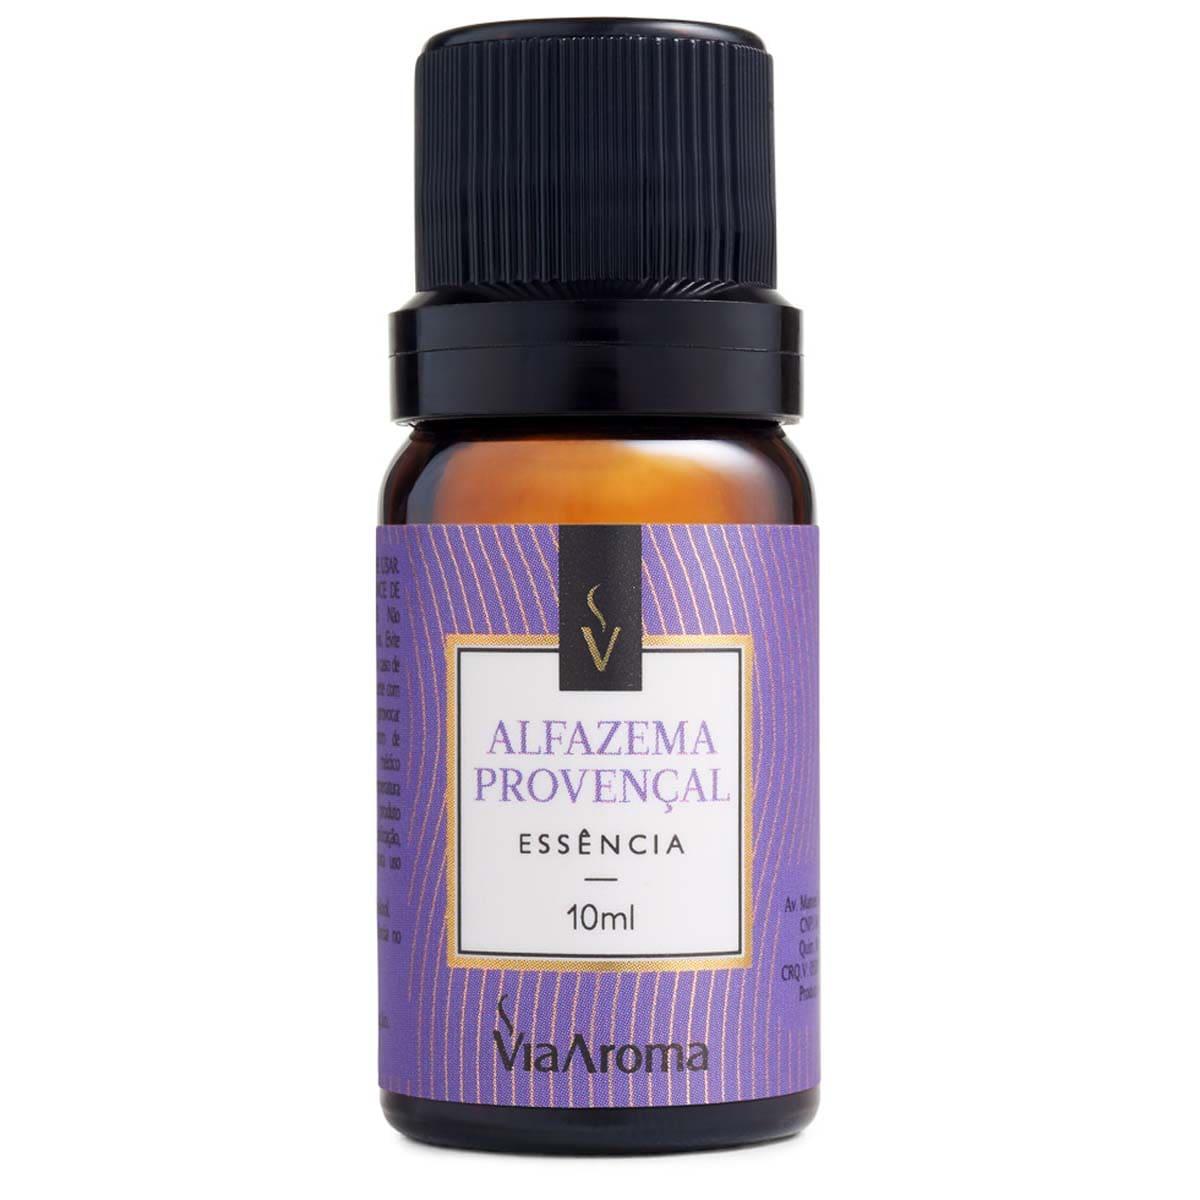 Essência alfazema provensal - via aroma